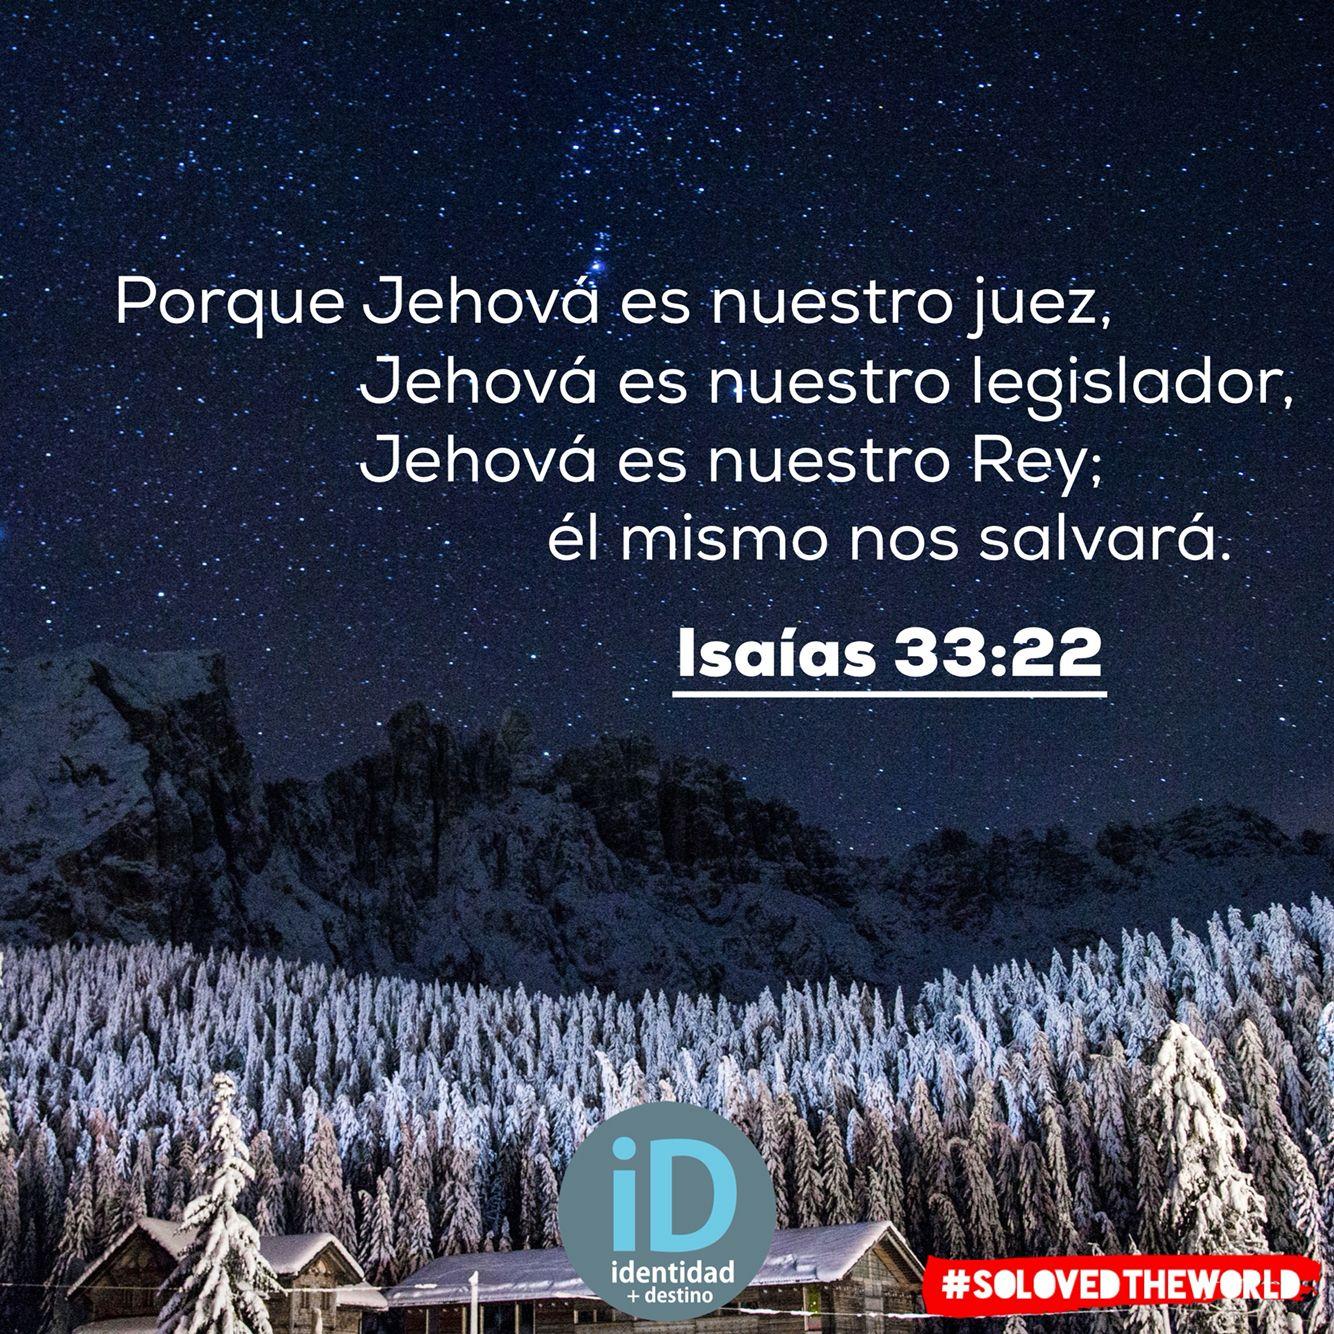 Porque Jehová es nuestro juez, Jehová es nuestro legislador, Jehová es nuestro Rey; él mismo nos salvará. Isaías 33:22 #Jesus #God #HolySpirit #Gospel #Bible #Love #Ideas #solovedtheworld